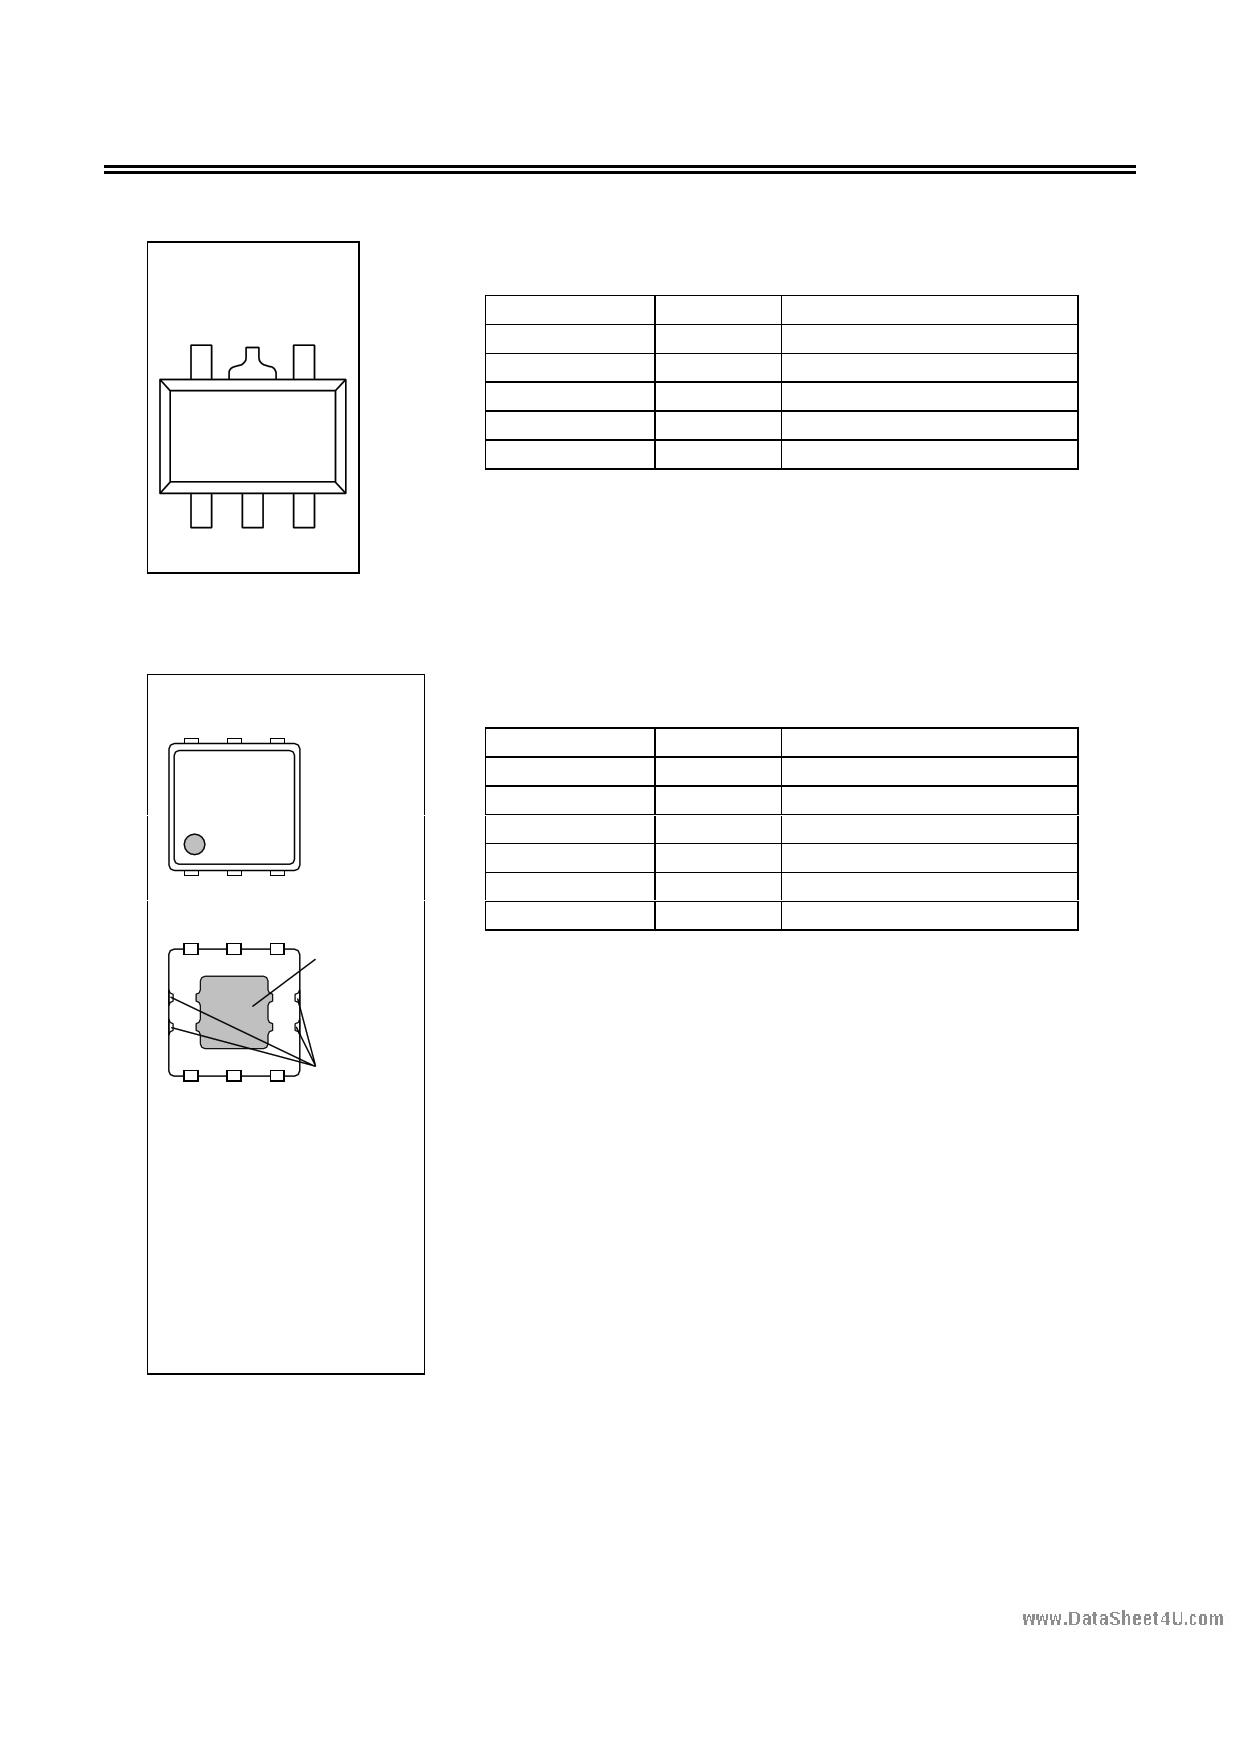 S-1170B pdf, arduino